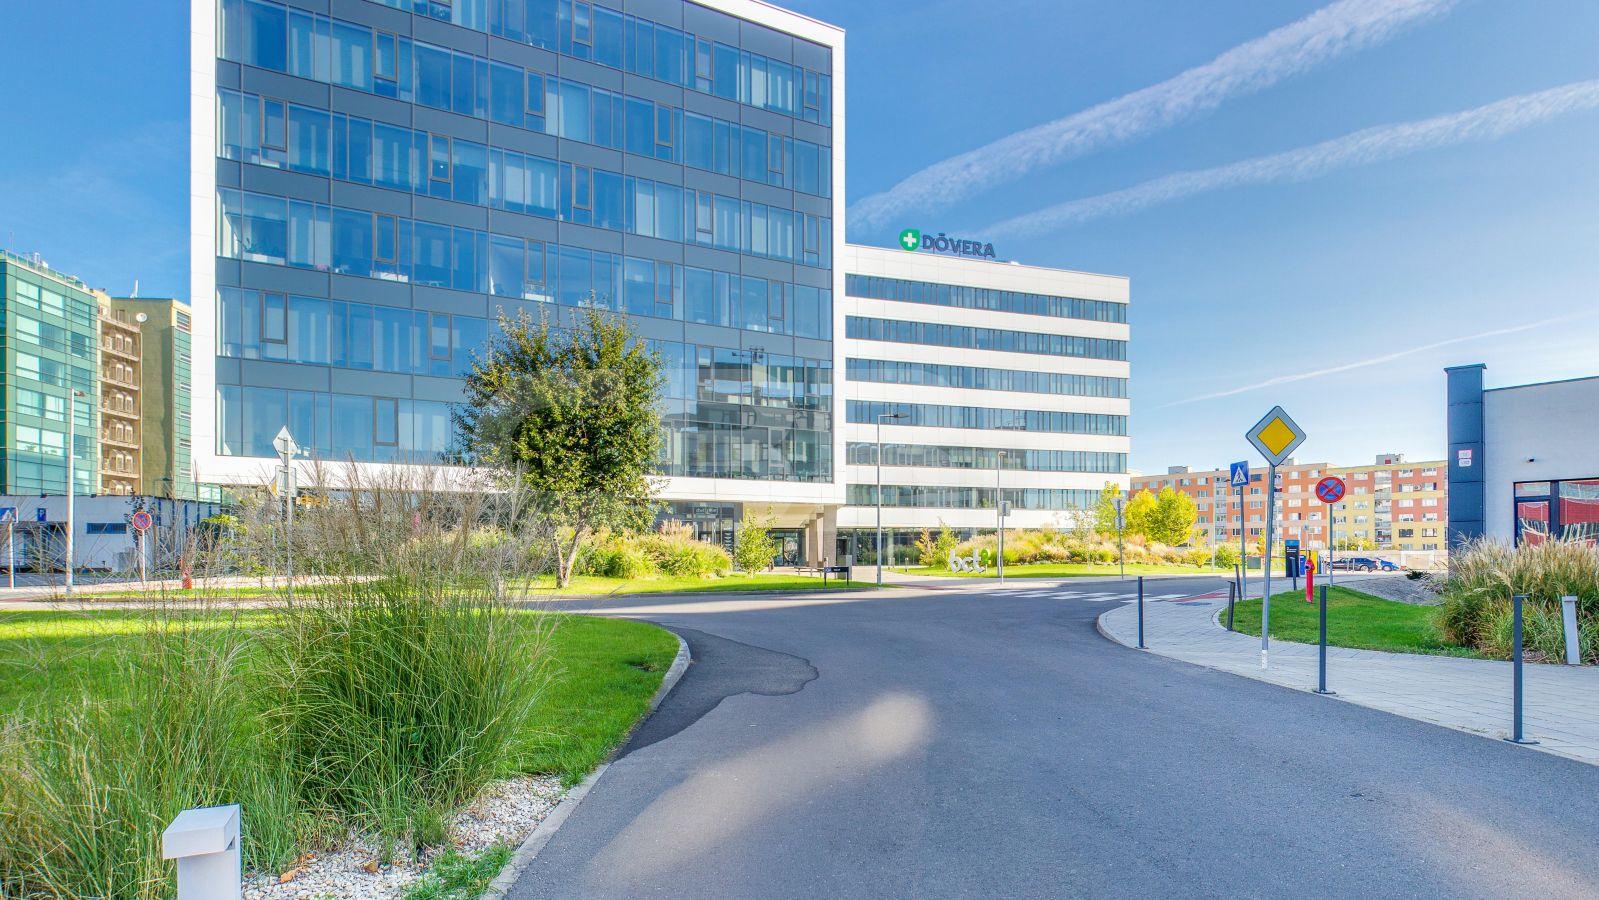 Business Center Tesla II., Košice - Staré Mesto | Offices for rent by CBRE | 4